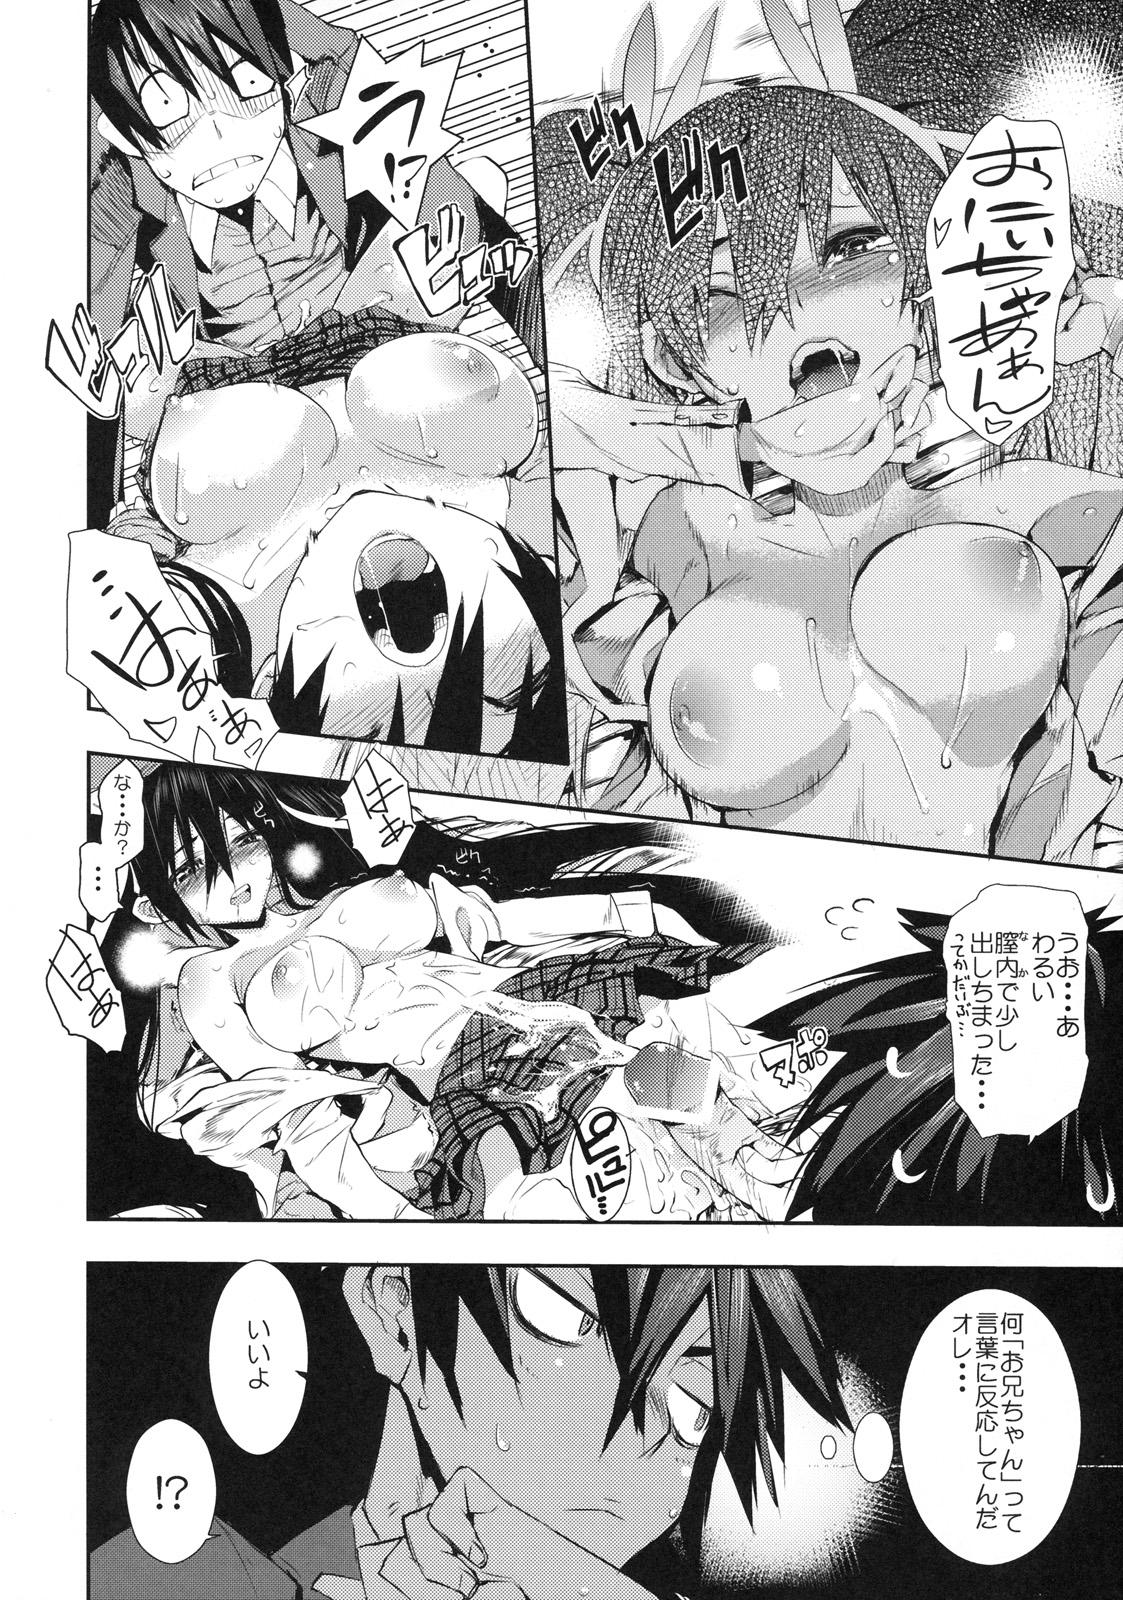 Shinzui Valentine Special Vol. 1 36